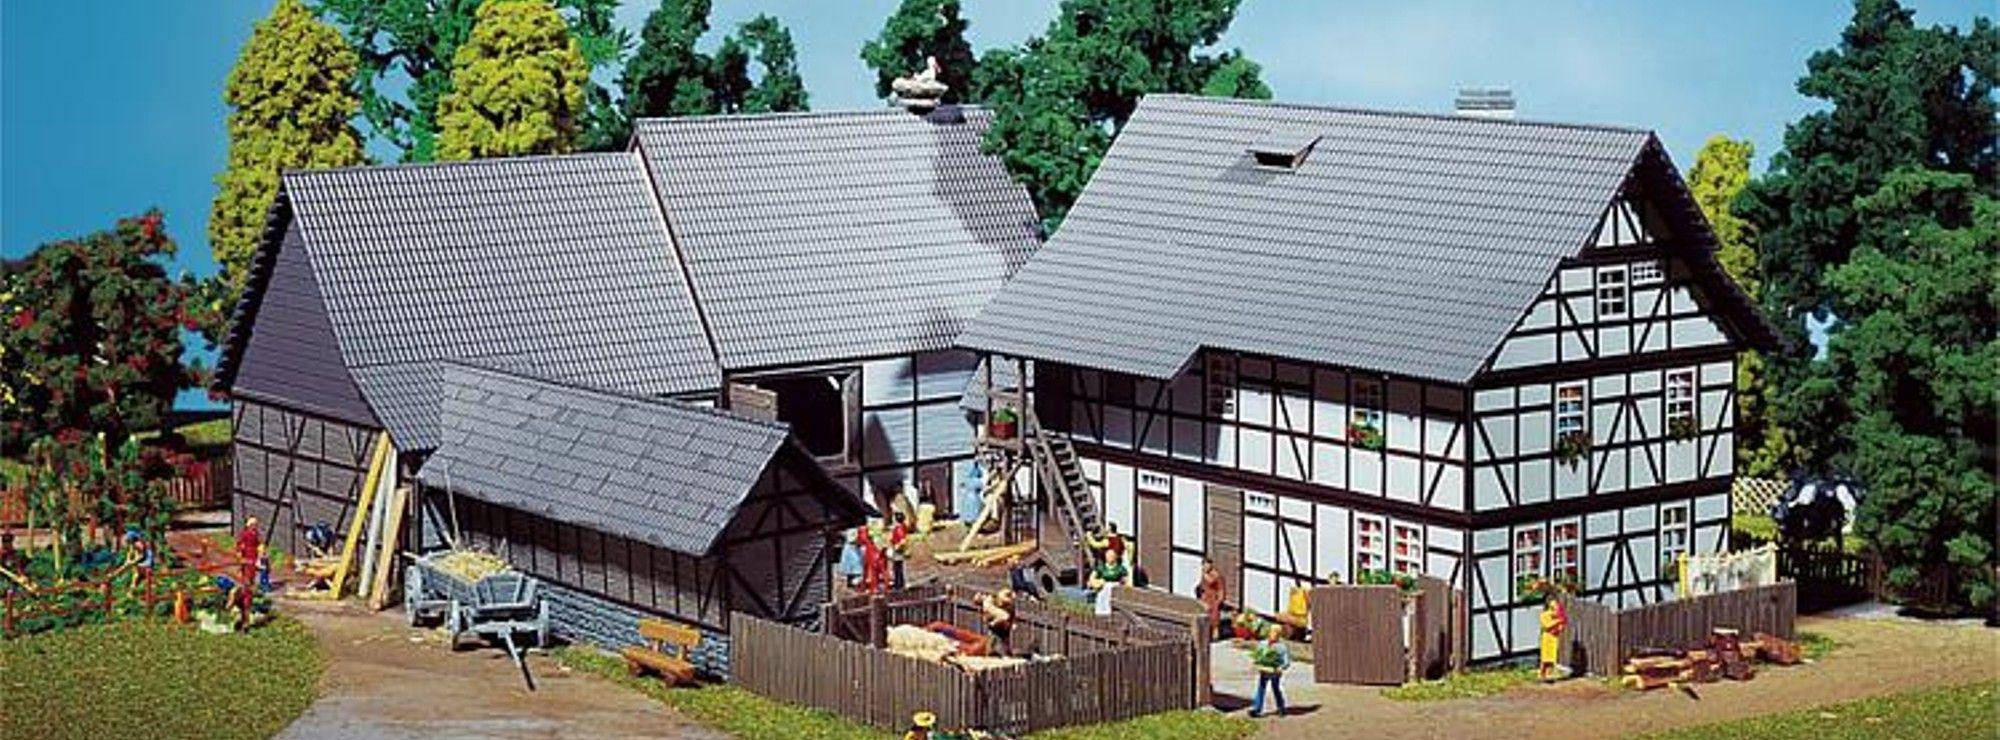 faller 130370 dreiseit hof bauernhof bausatz spur h0. Black Bedroom Furniture Sets. Home Design Ideas